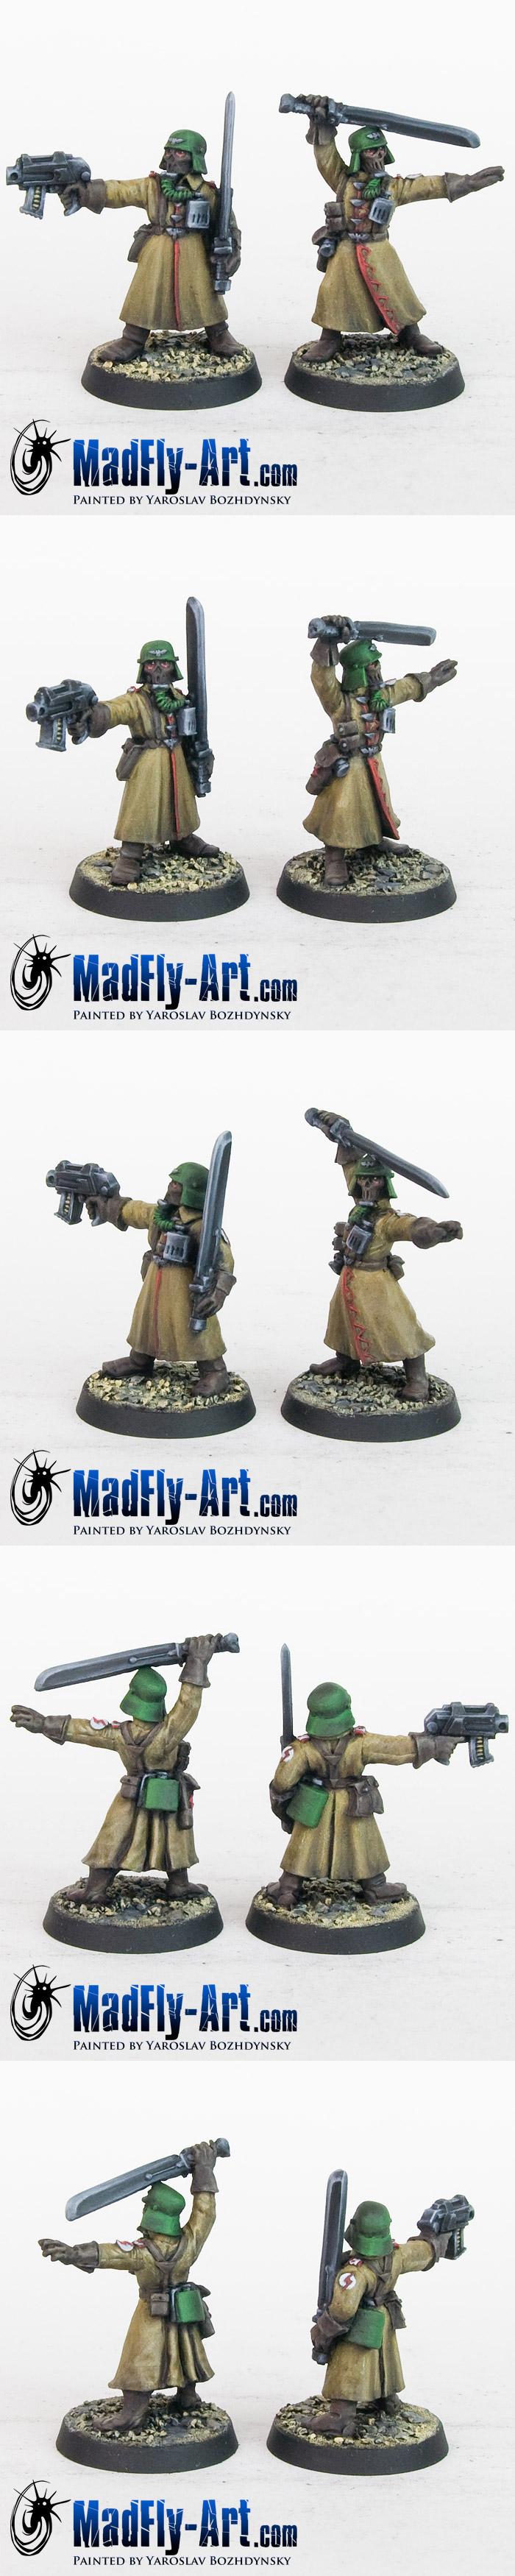 Steel Legion Lieutenants